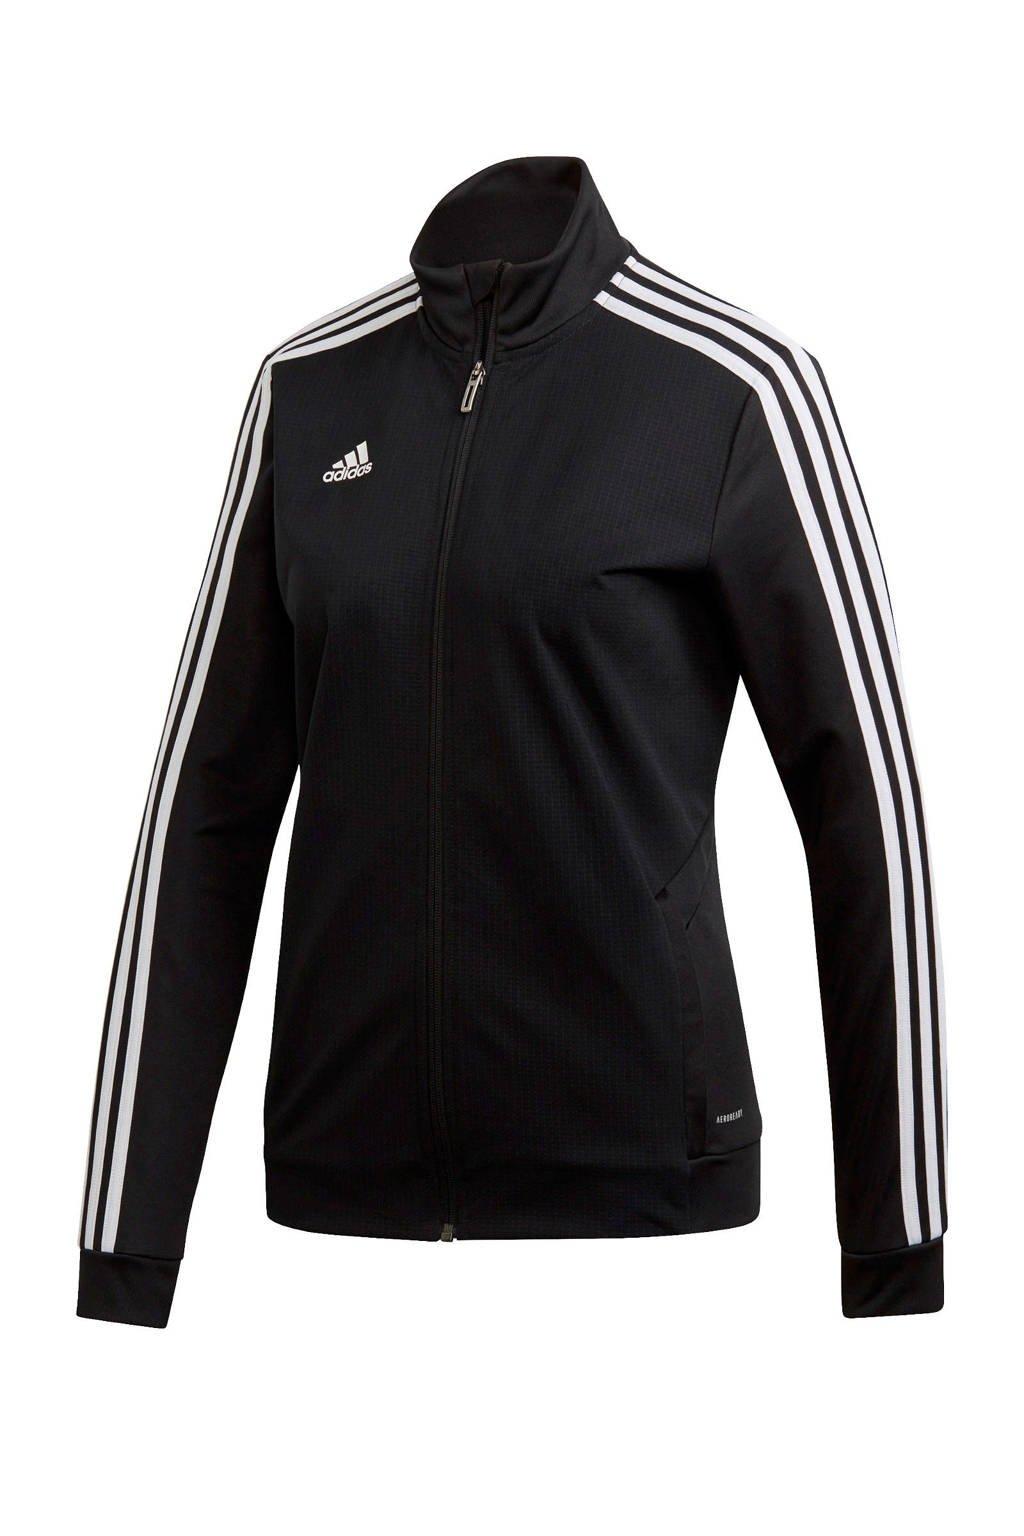 adidas Performance sportvest Tiro 19 zwart, Zwart/wit